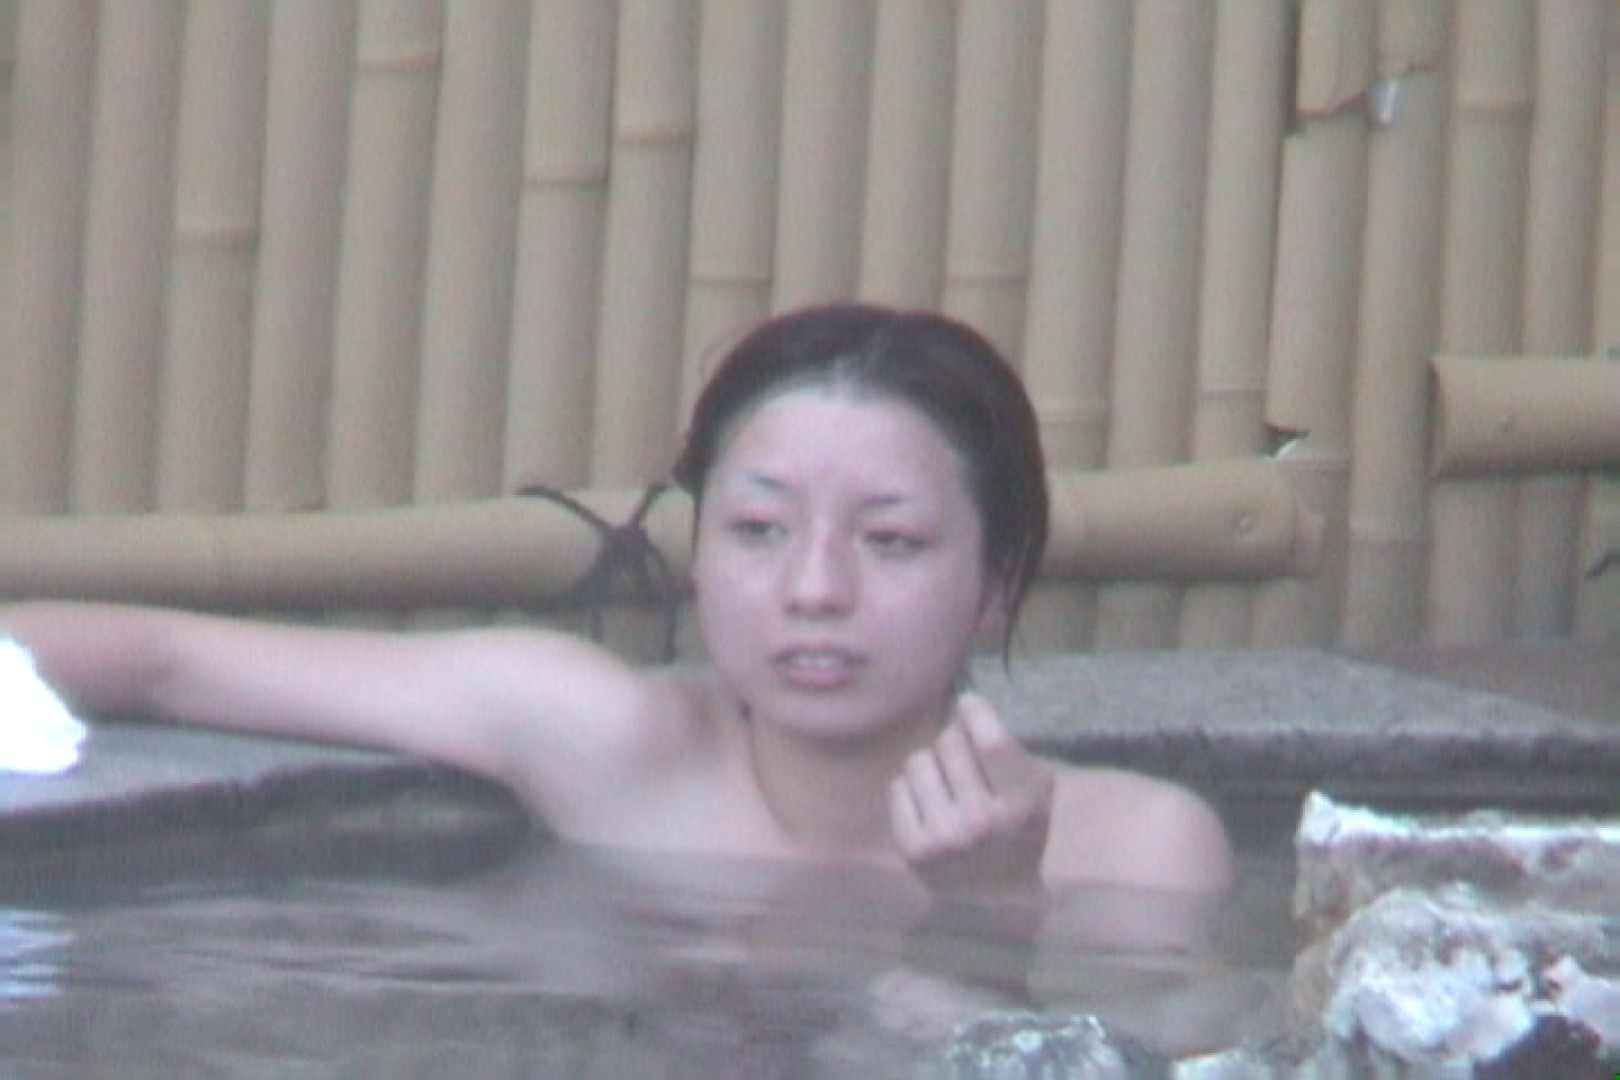 Aquaな露天風呂Vol.608 HなOL | 盗撮  89pic 77